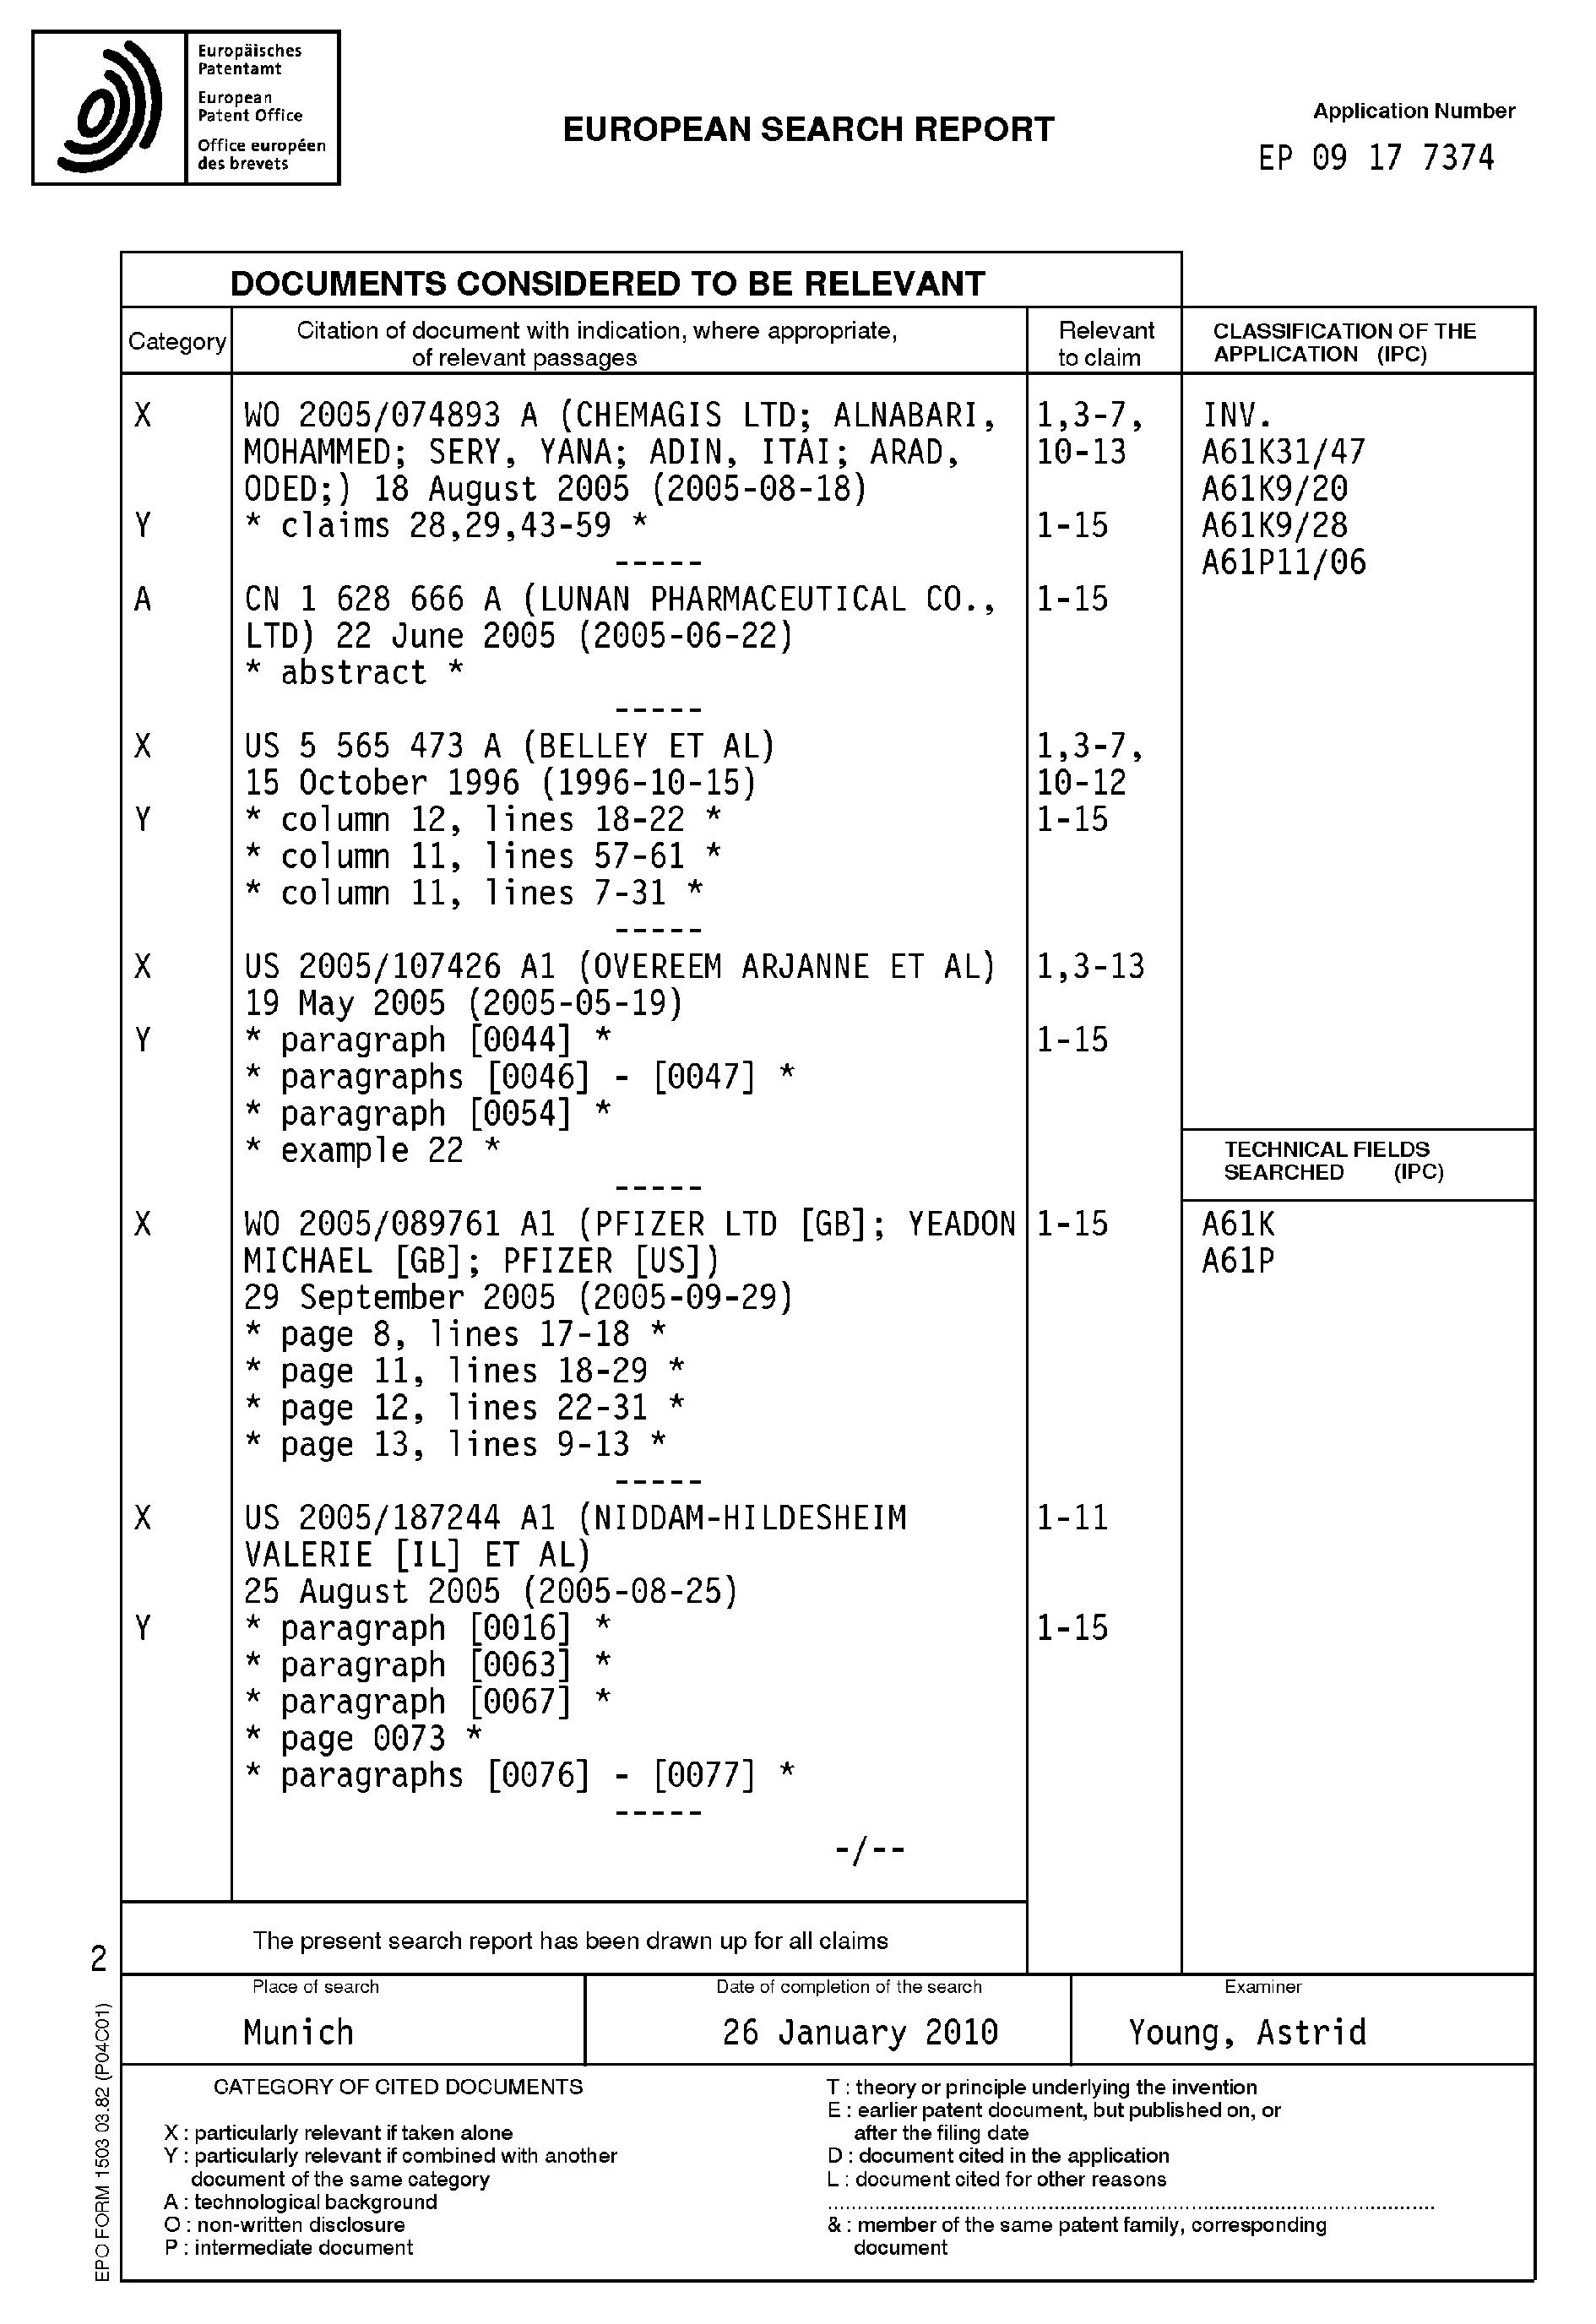 Generic singulair inactive ingredients.doc - Patent Drawing